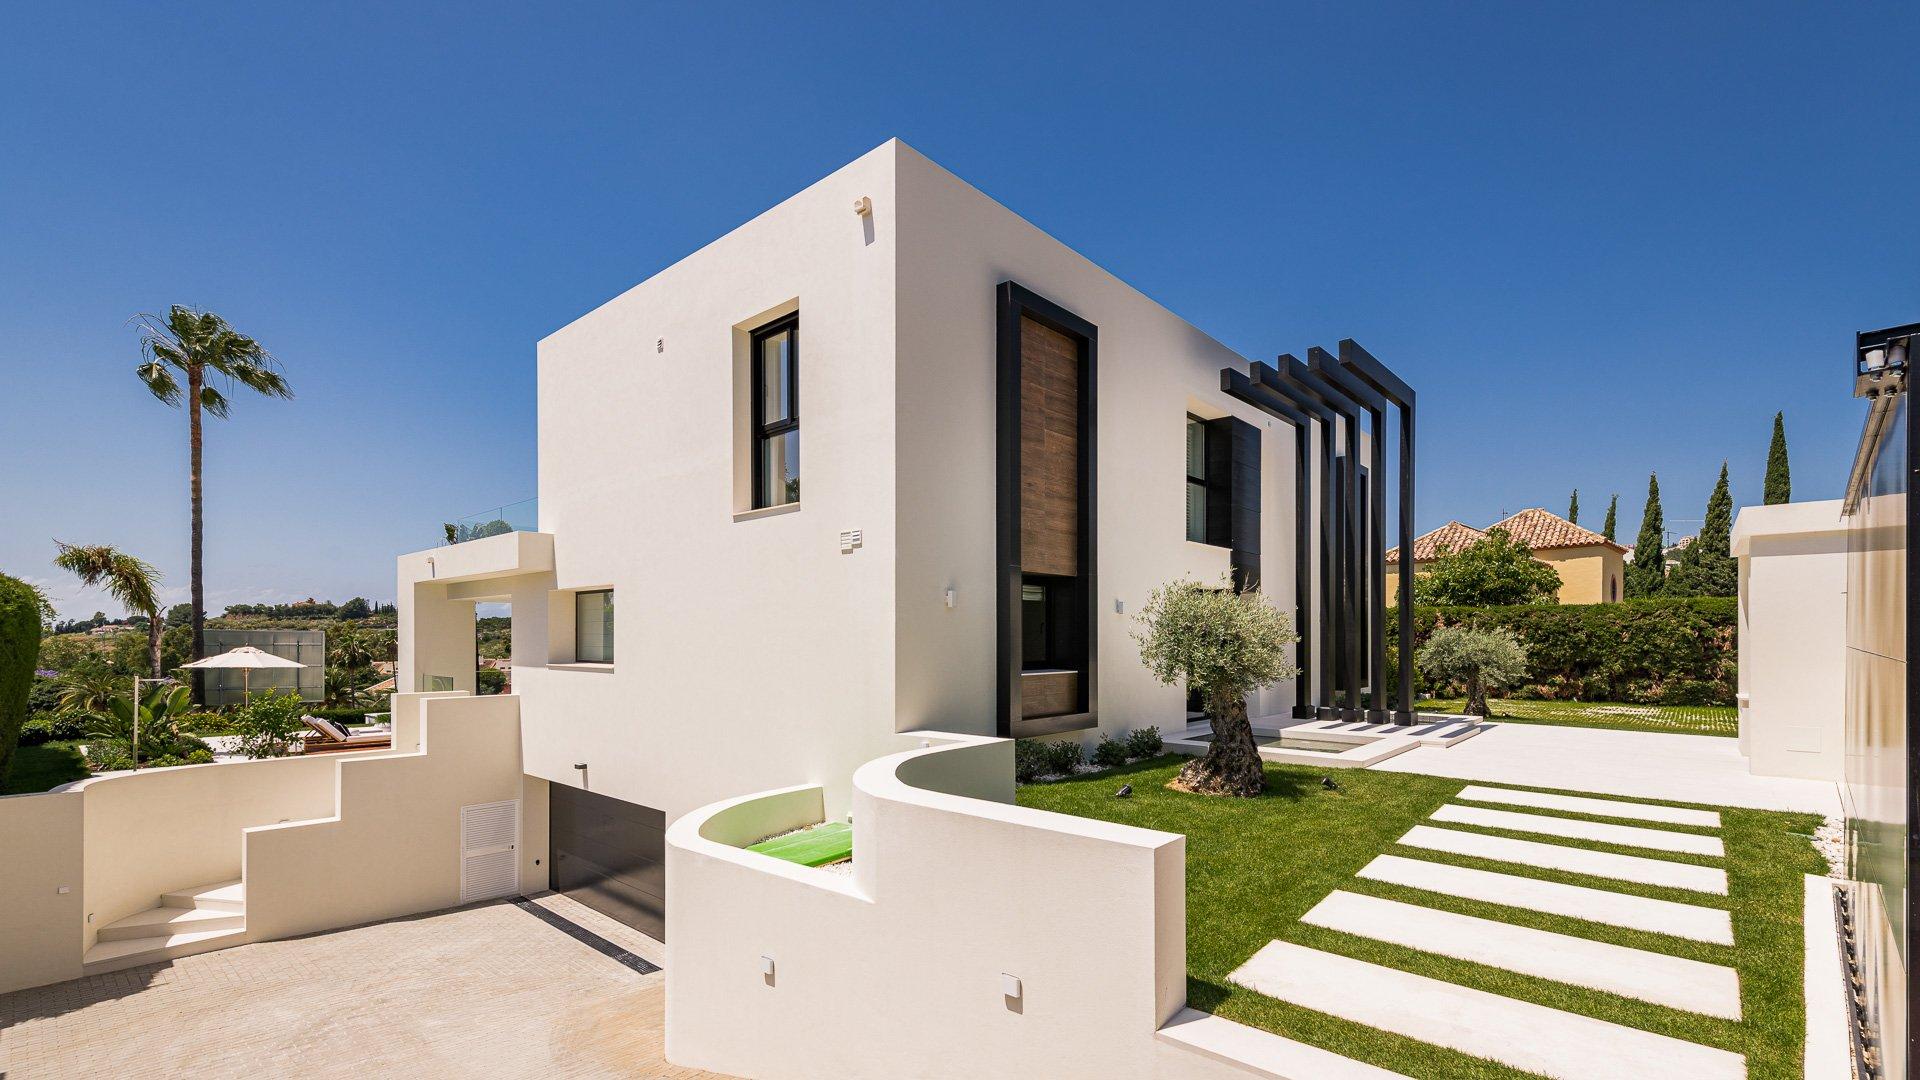 Villa Oak: Impressive front line golf villa in Nueva Andalucía, Marbella